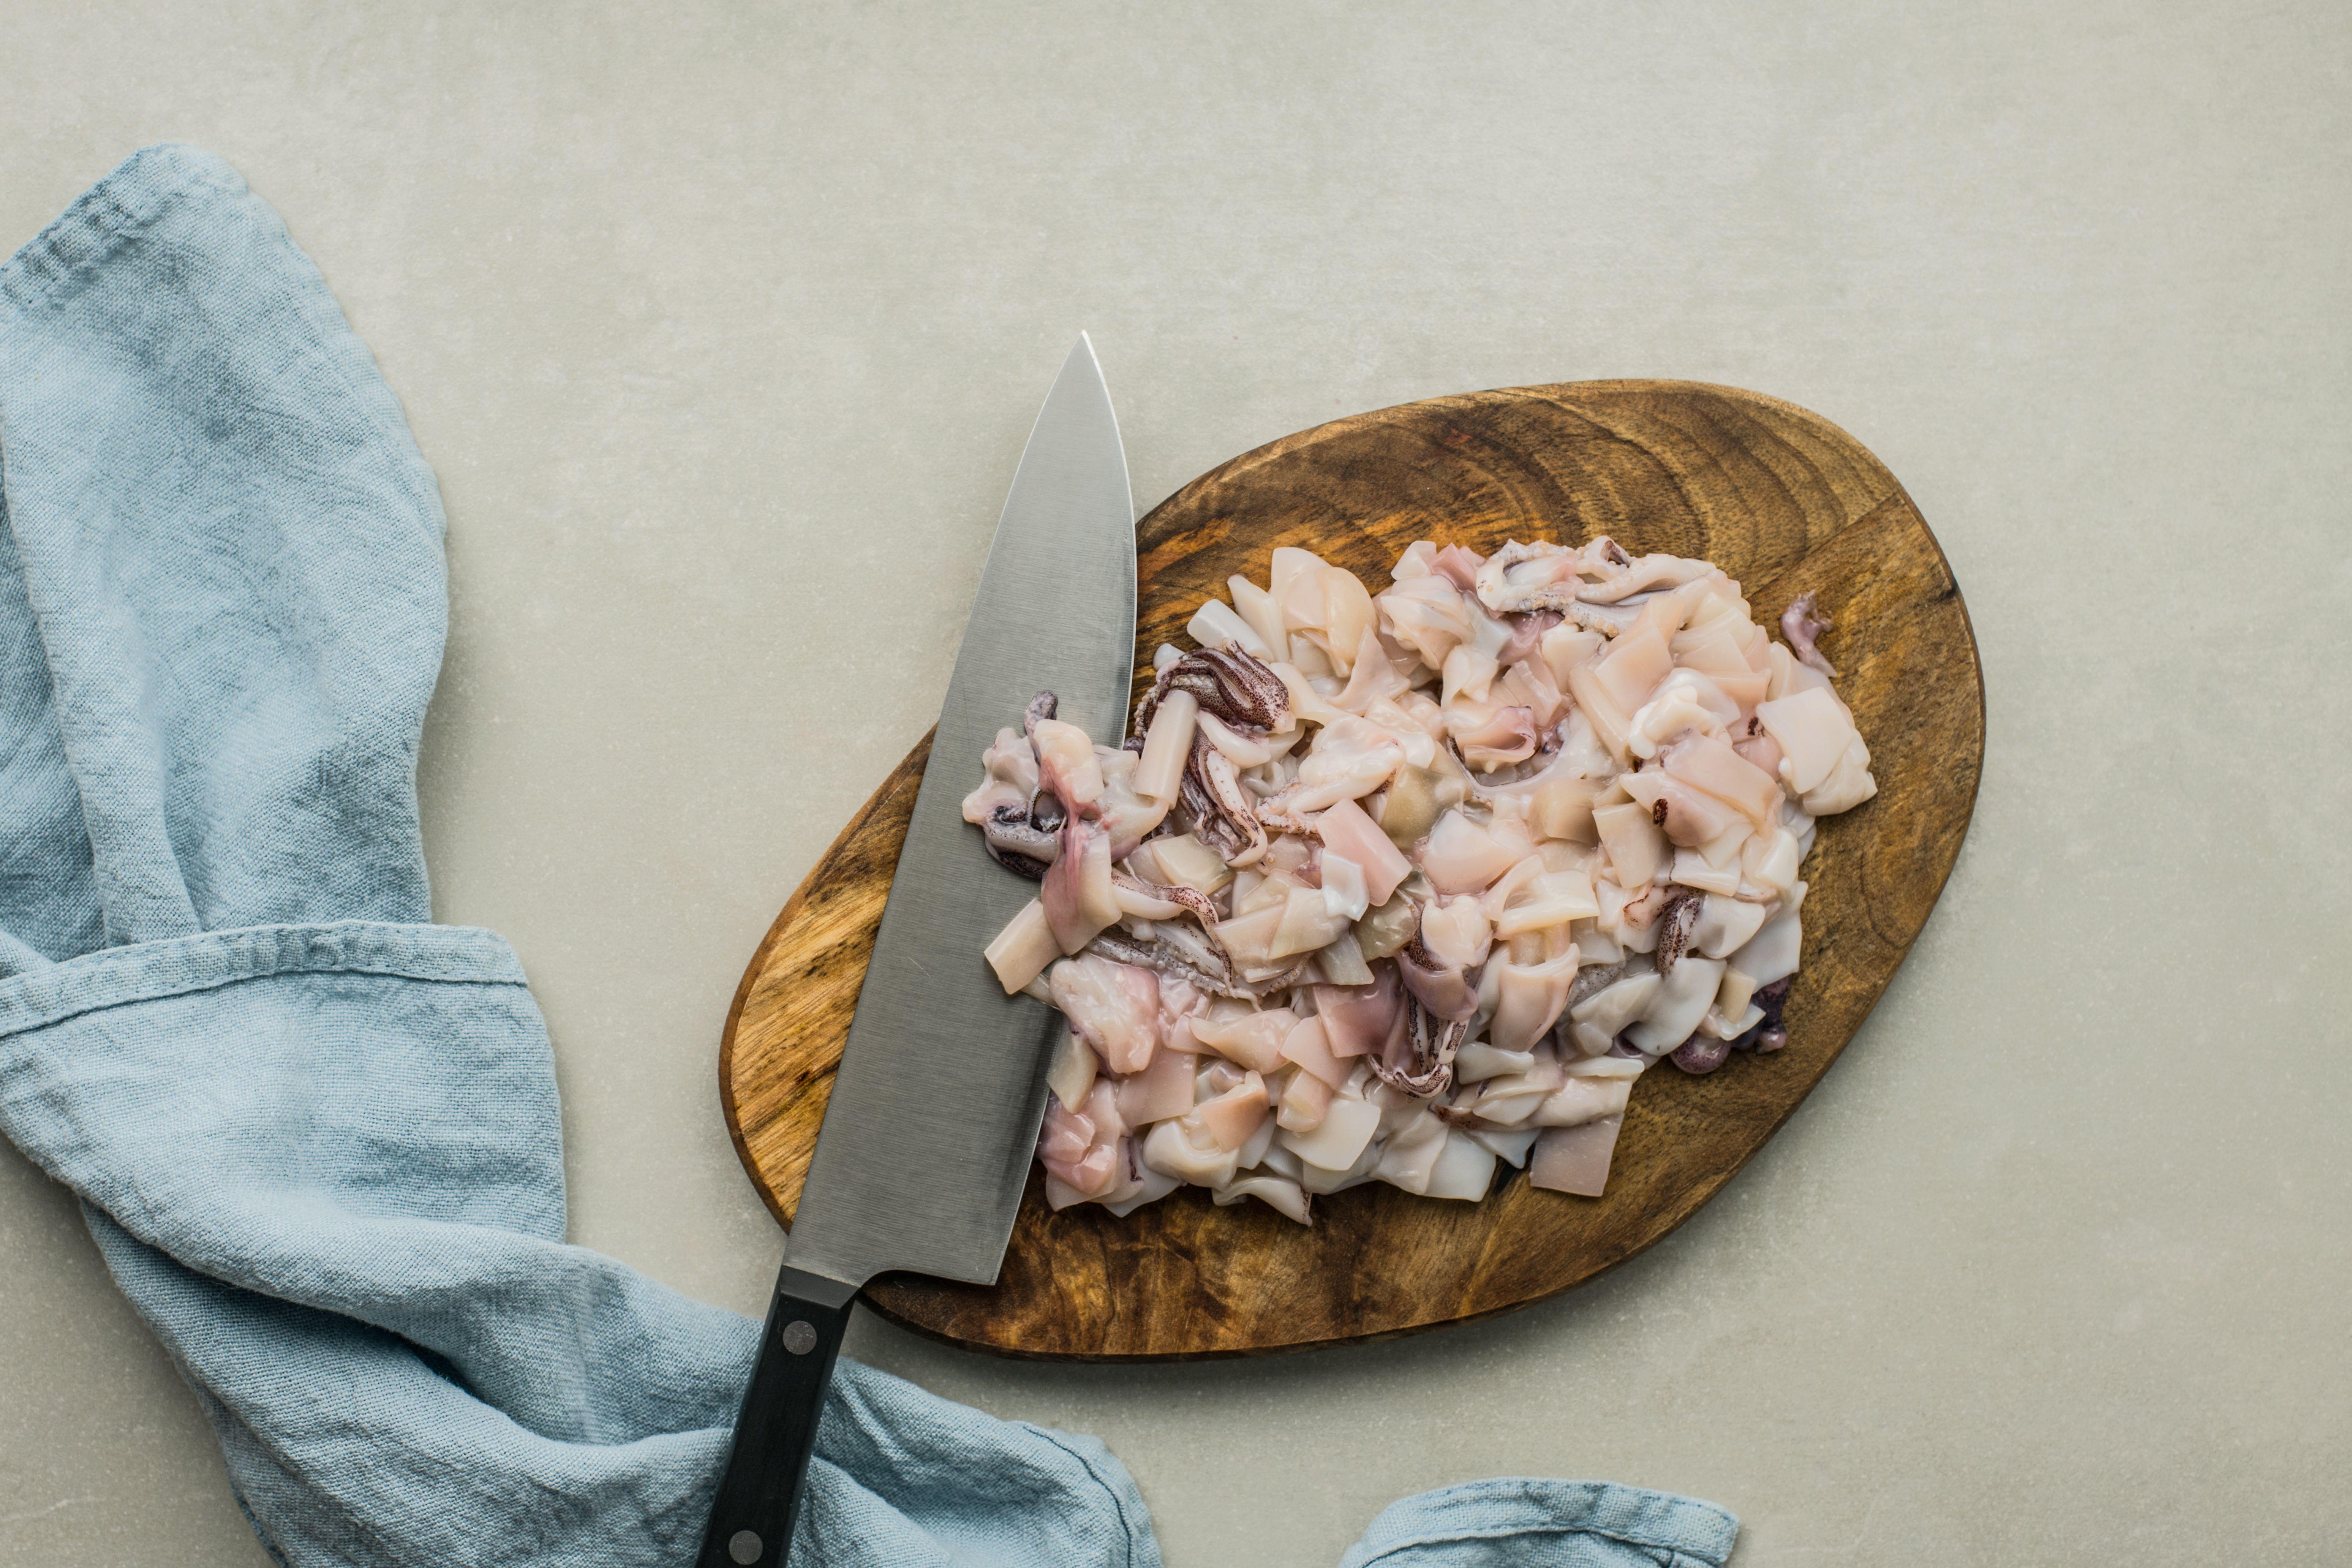 Diced squid on a cutting board